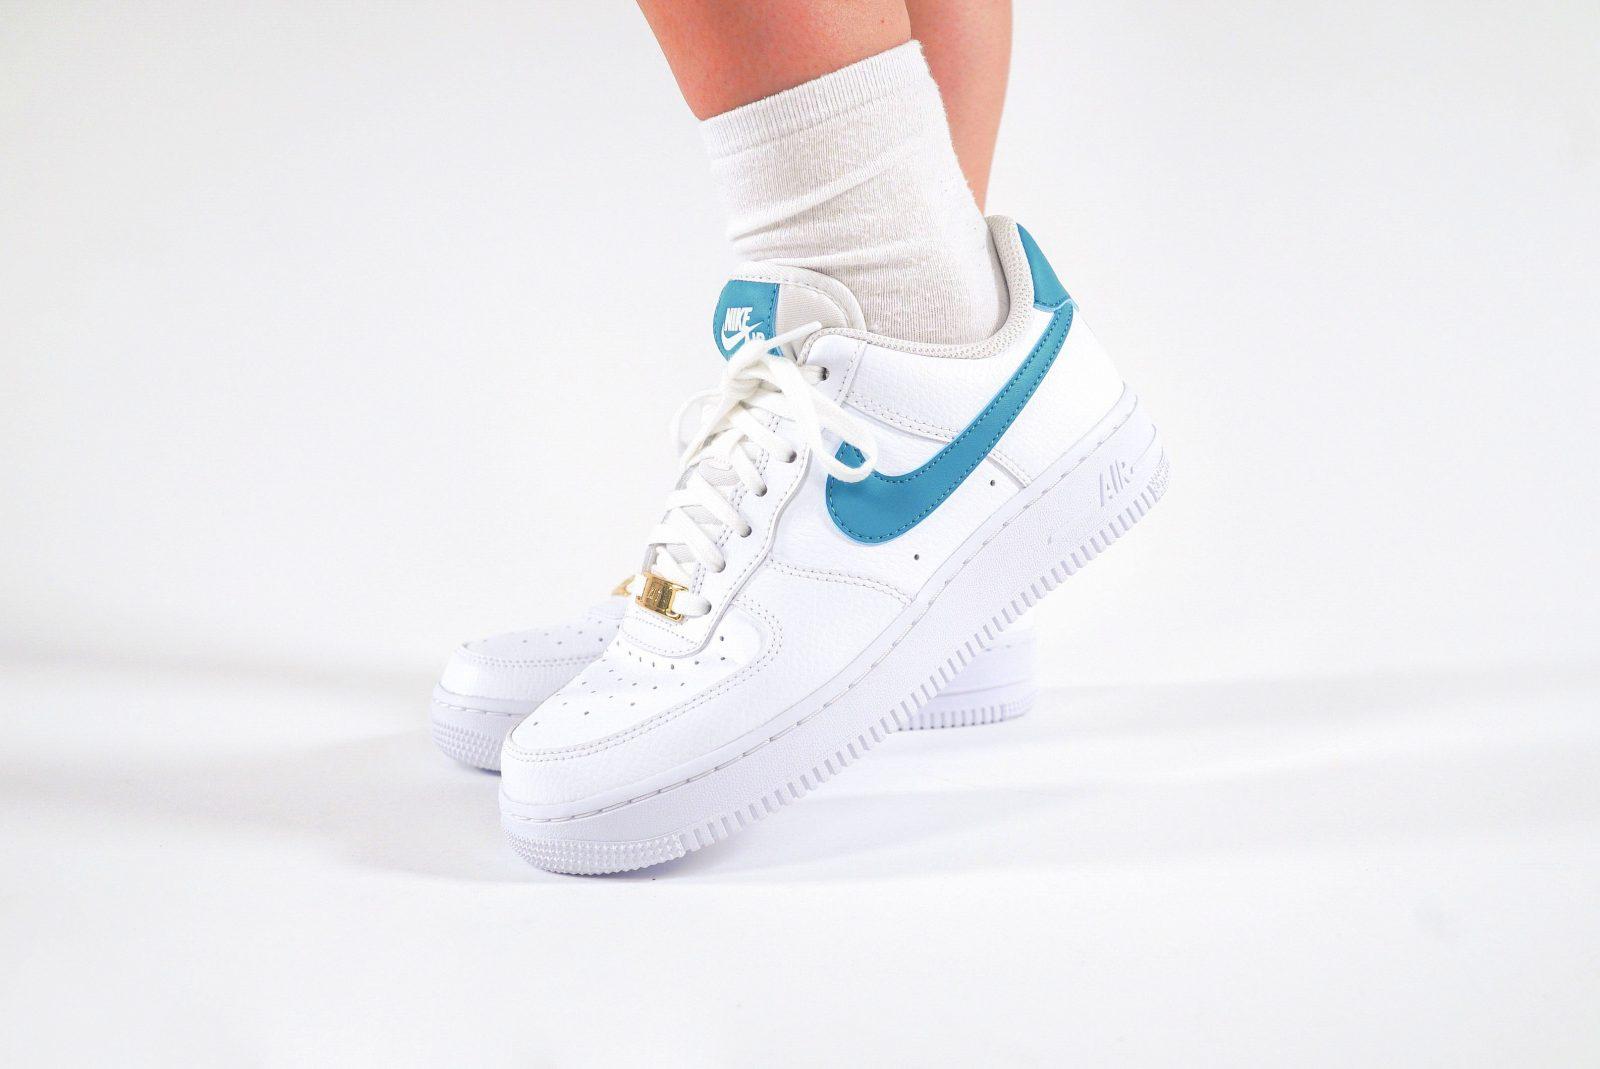 Nike Air Force 1 Teal Nebula The Sole Womens side 2